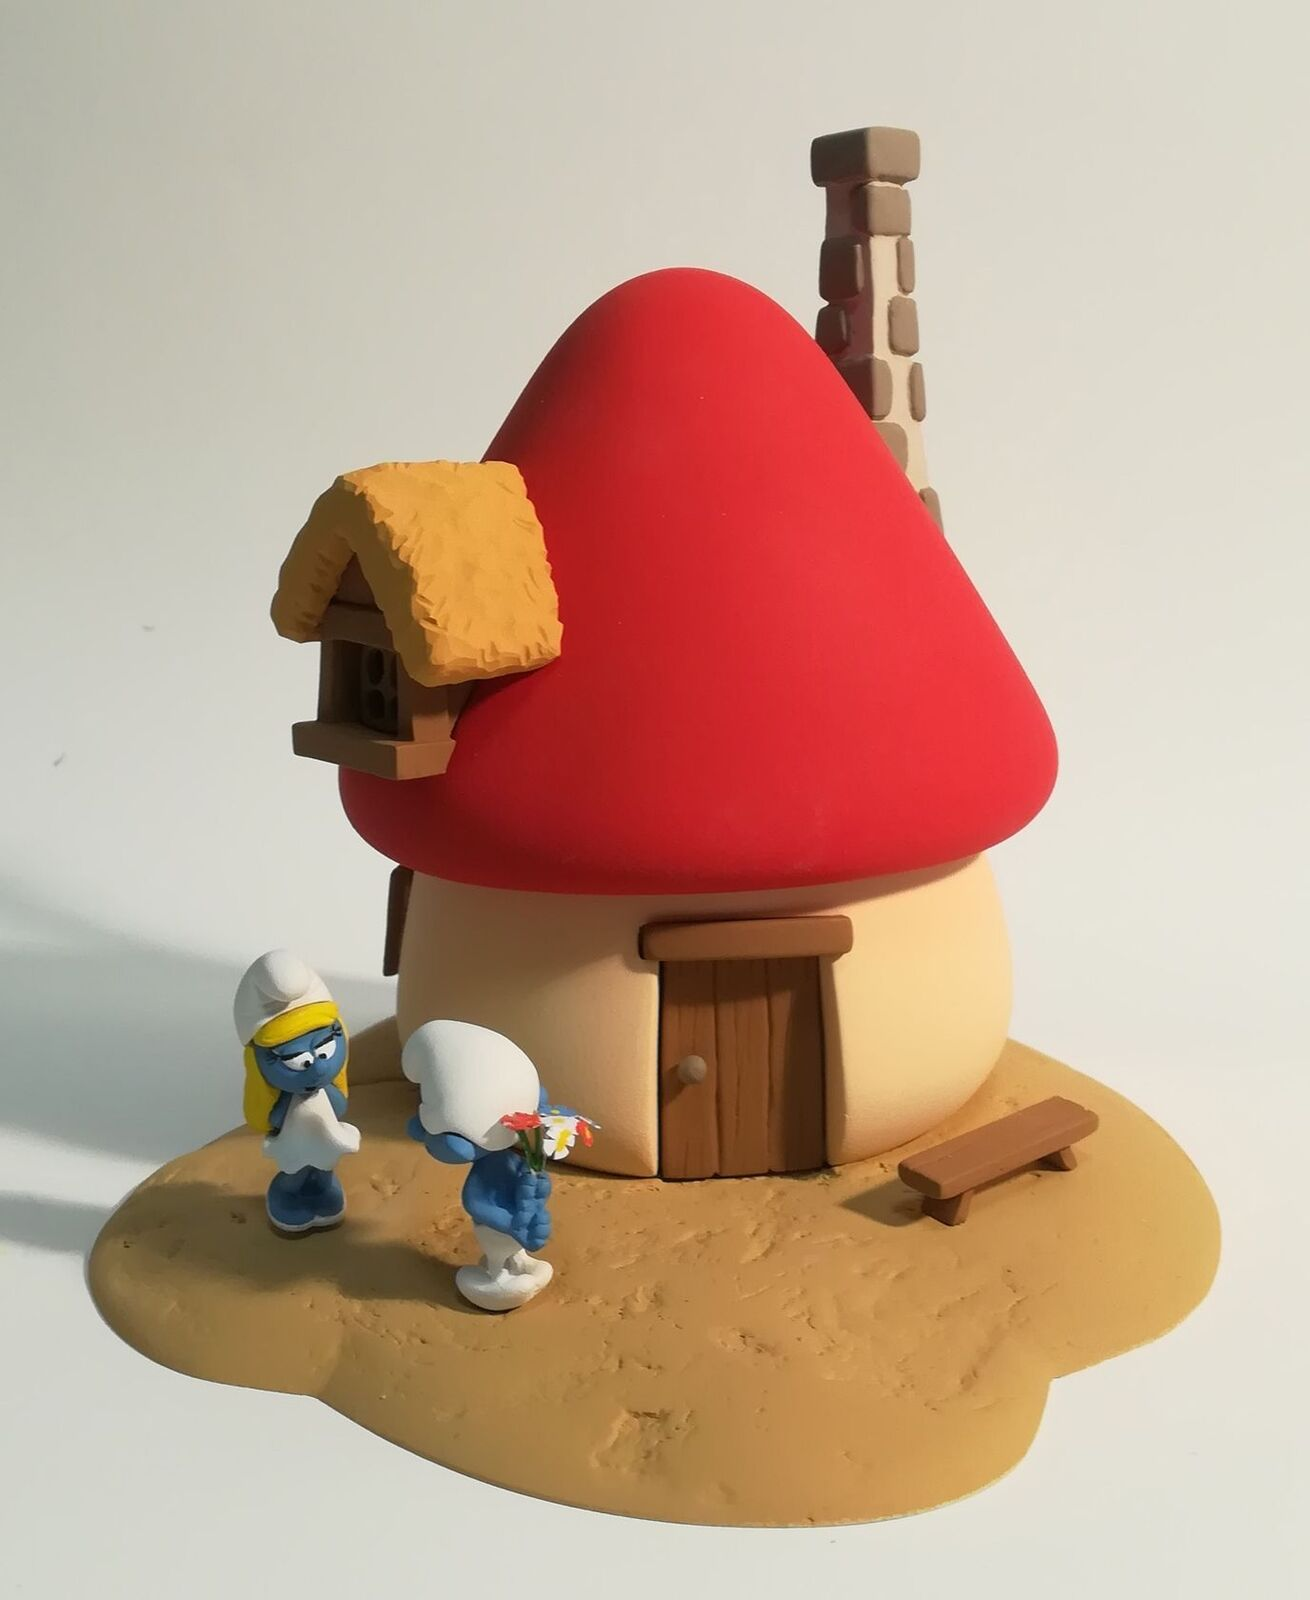 Statuette r;sina Schtrompfs (Les) La maison de la Schtrompfette Fariboli